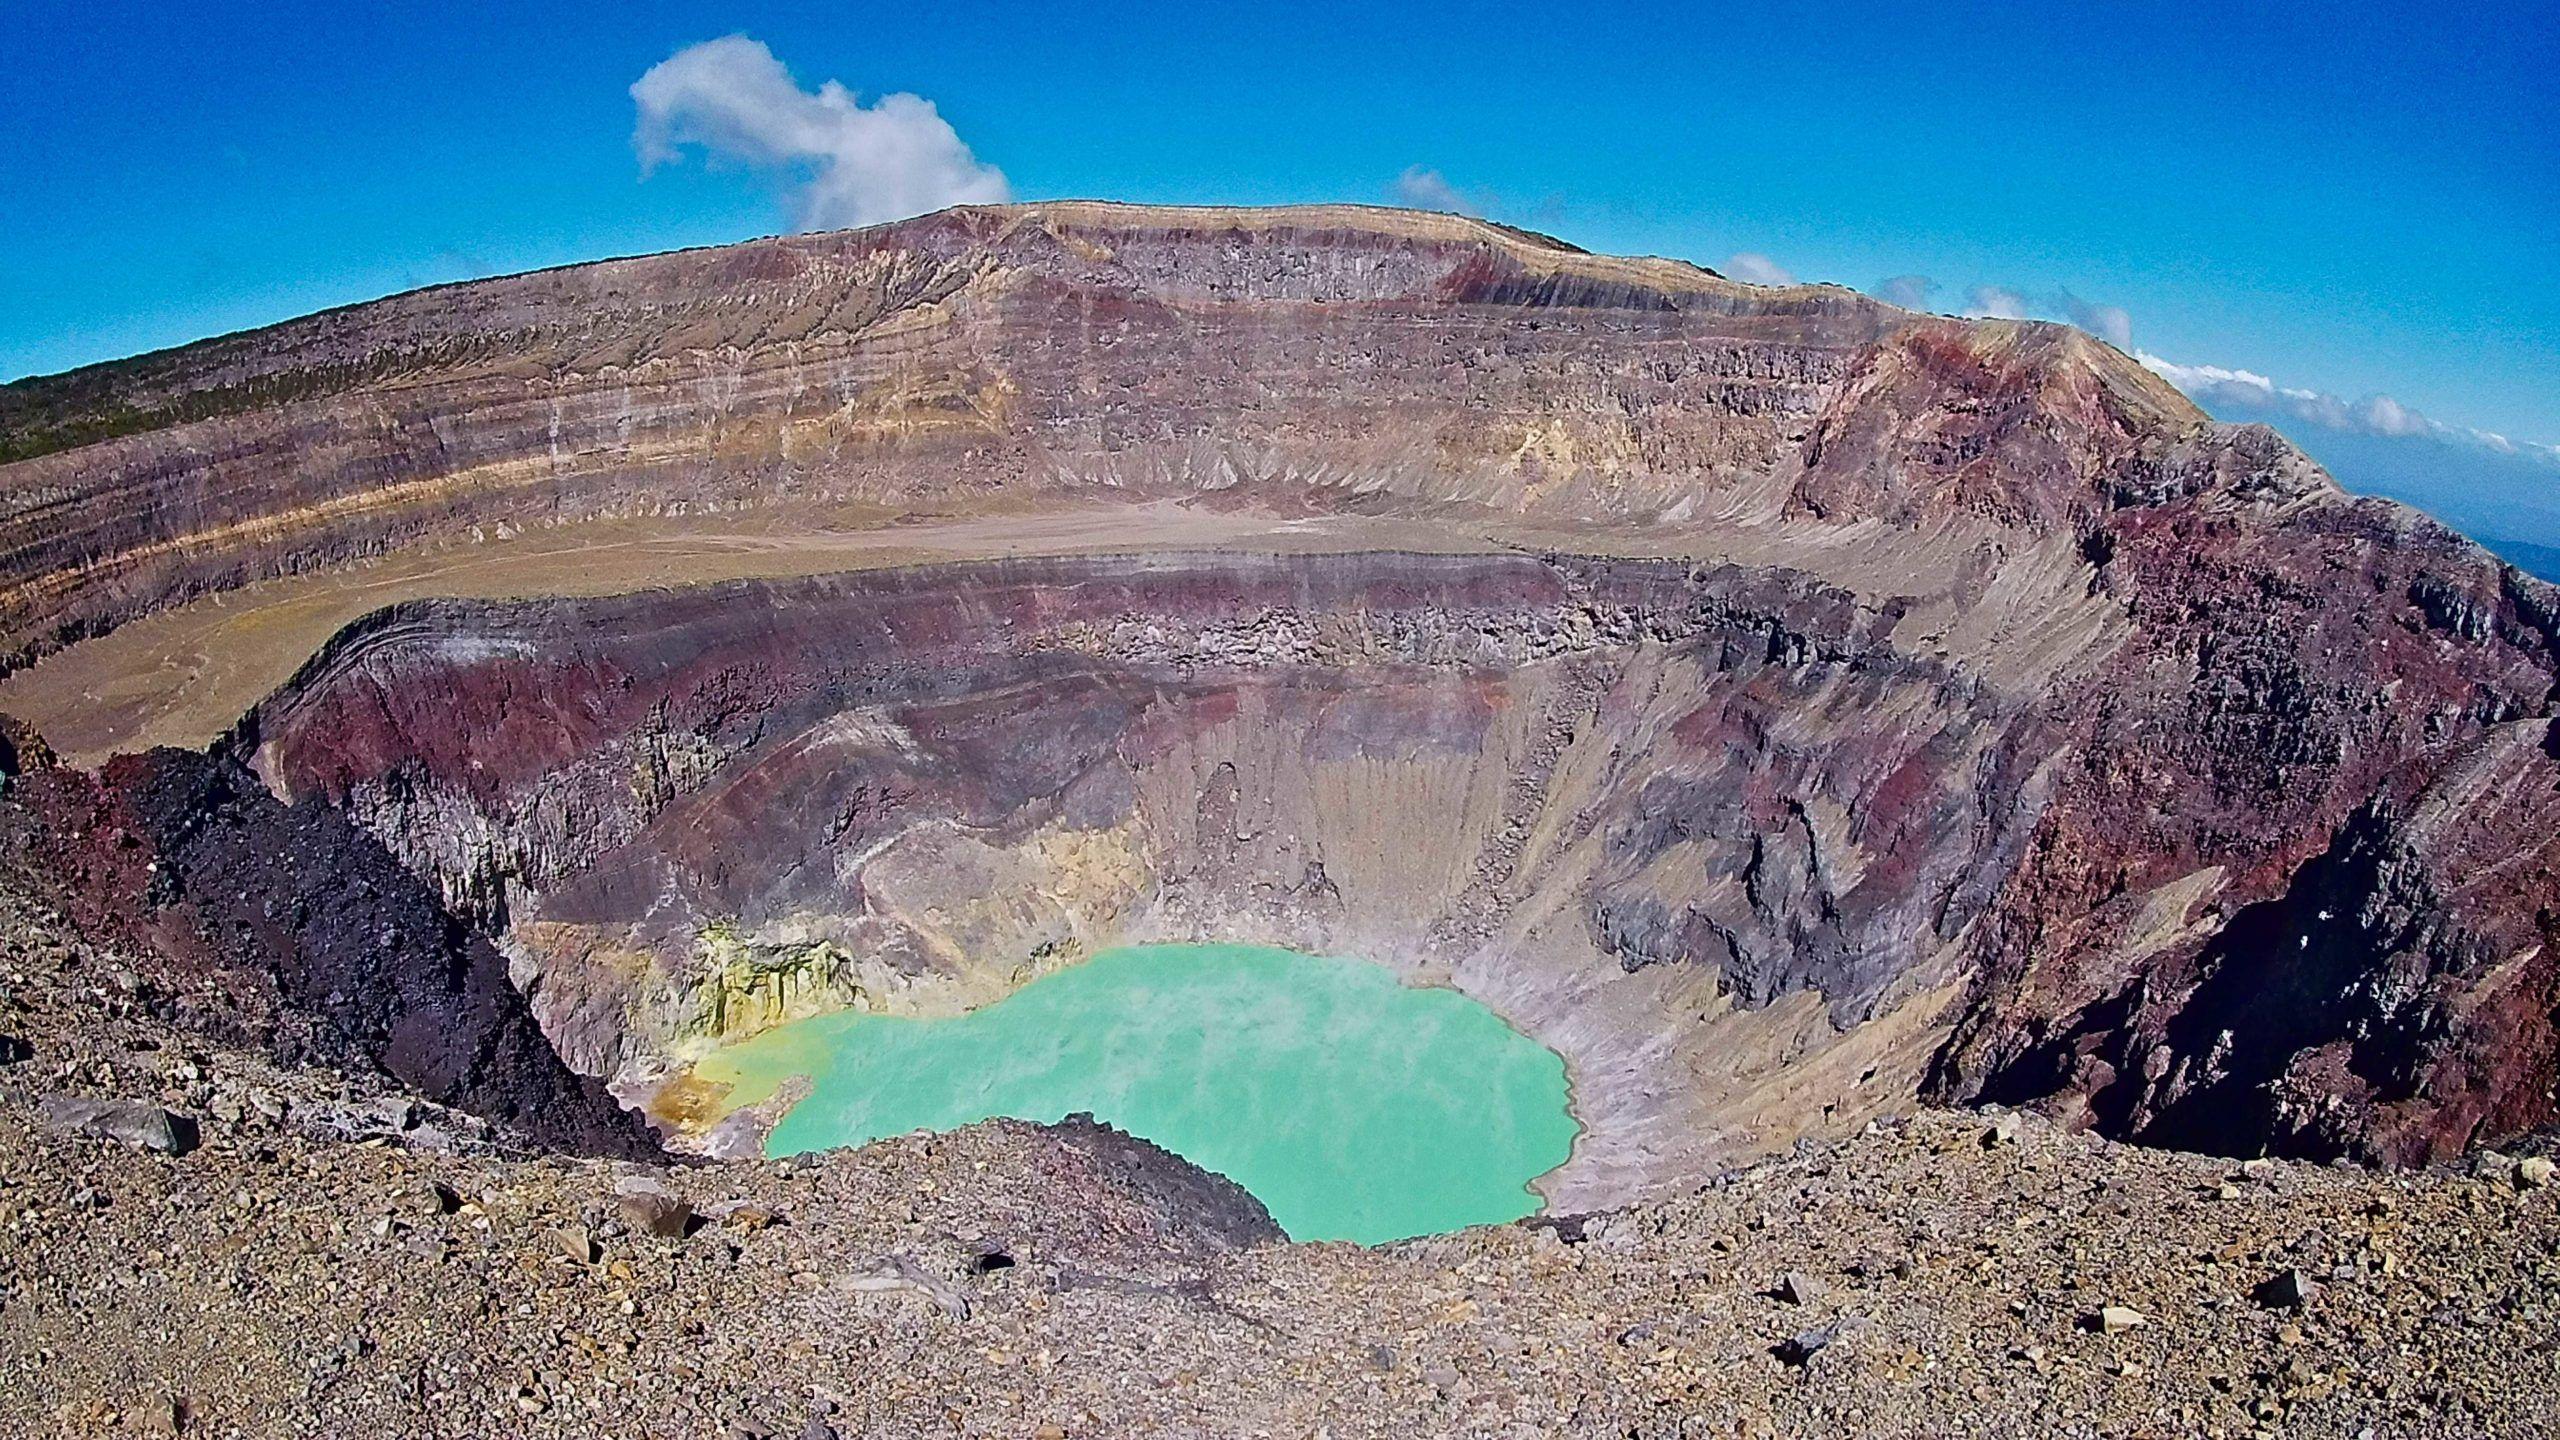 Crater lake | Hiking Santa Ana Volcano in El Salvador | FinnsAway Travel Blog